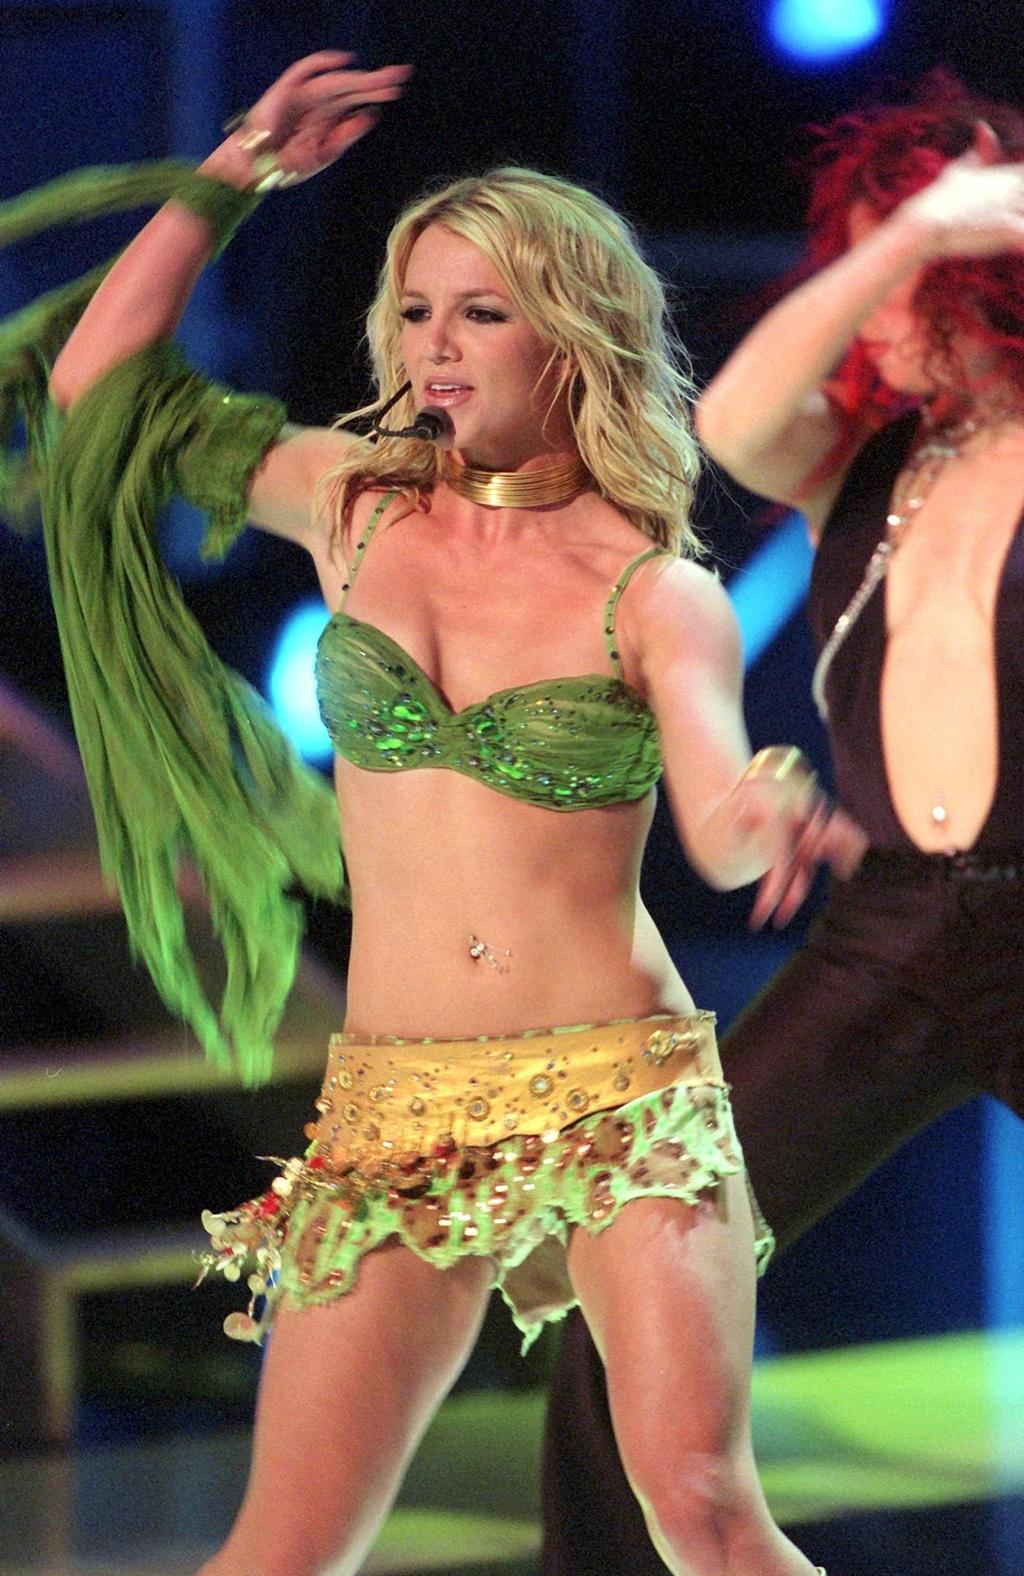 Britney Spears - cong chua nhac pop va cu truot dai trong su nghiep hinh anh 7 15.jpg